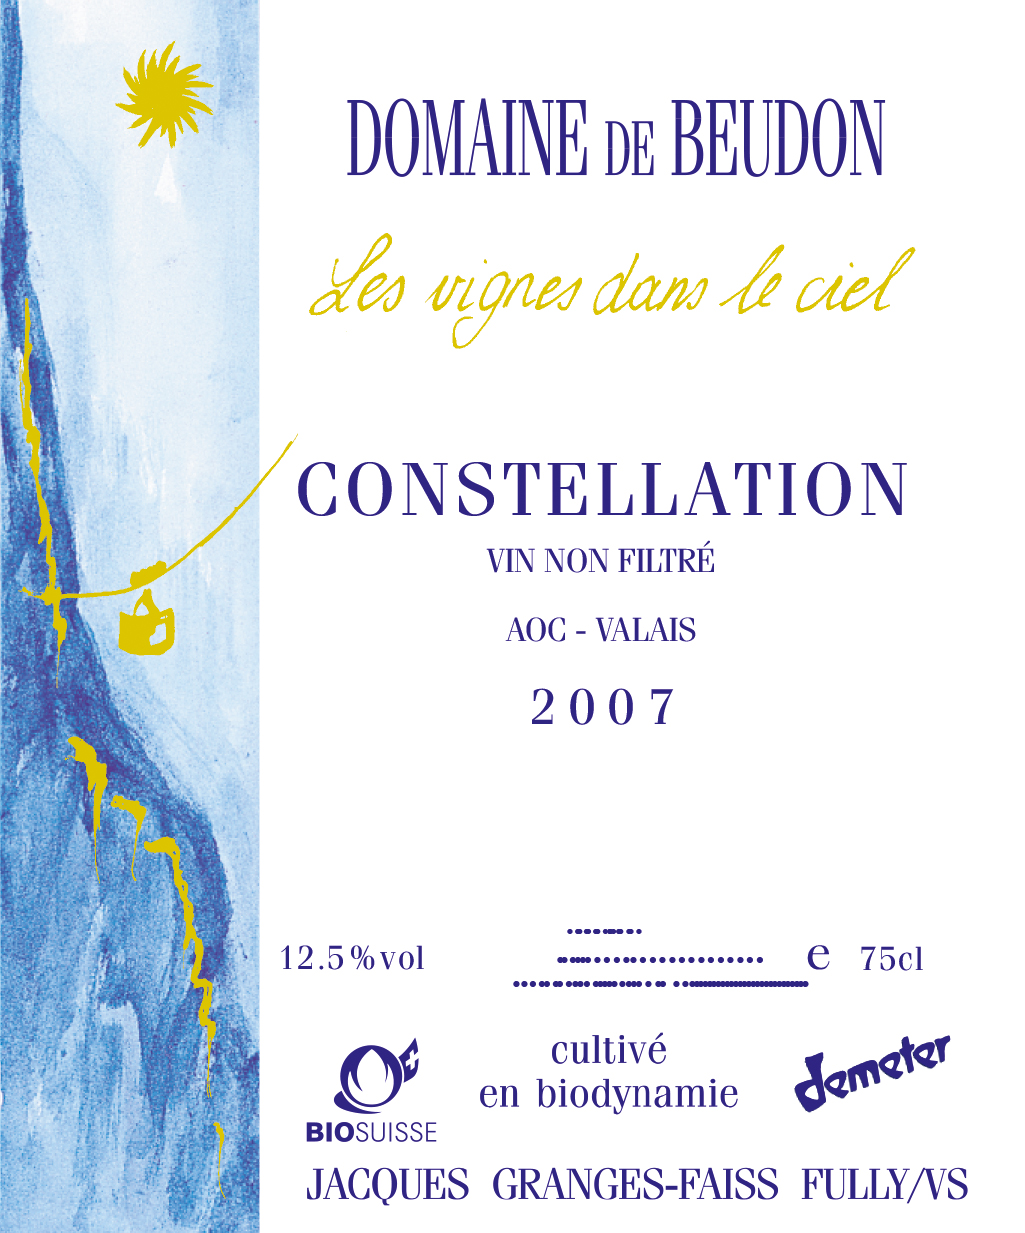 beudon_constellaion_2007.jpg